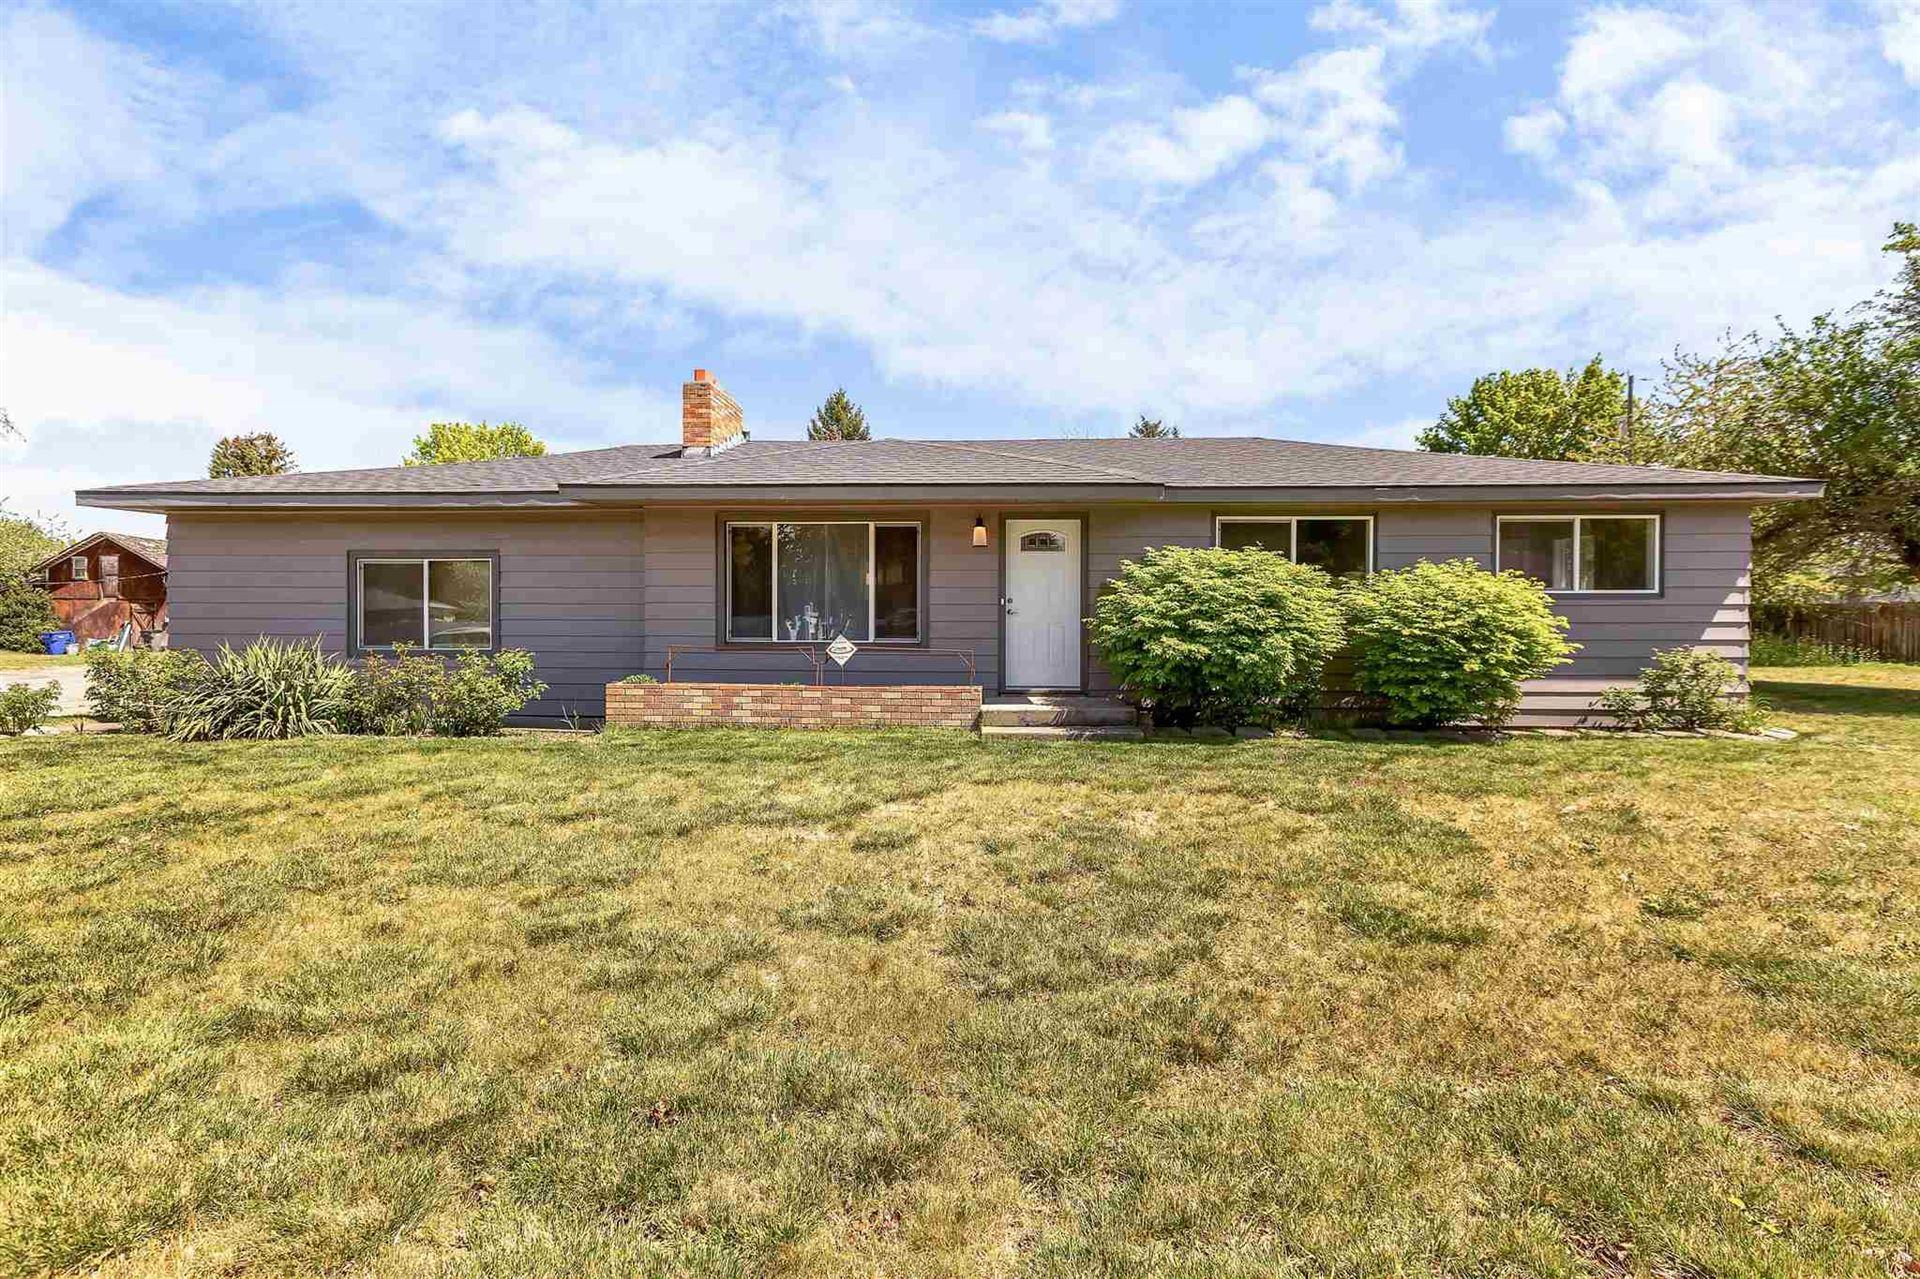 507 S Evergreen Rd, Spokane, WA 99216 - #: 202115135